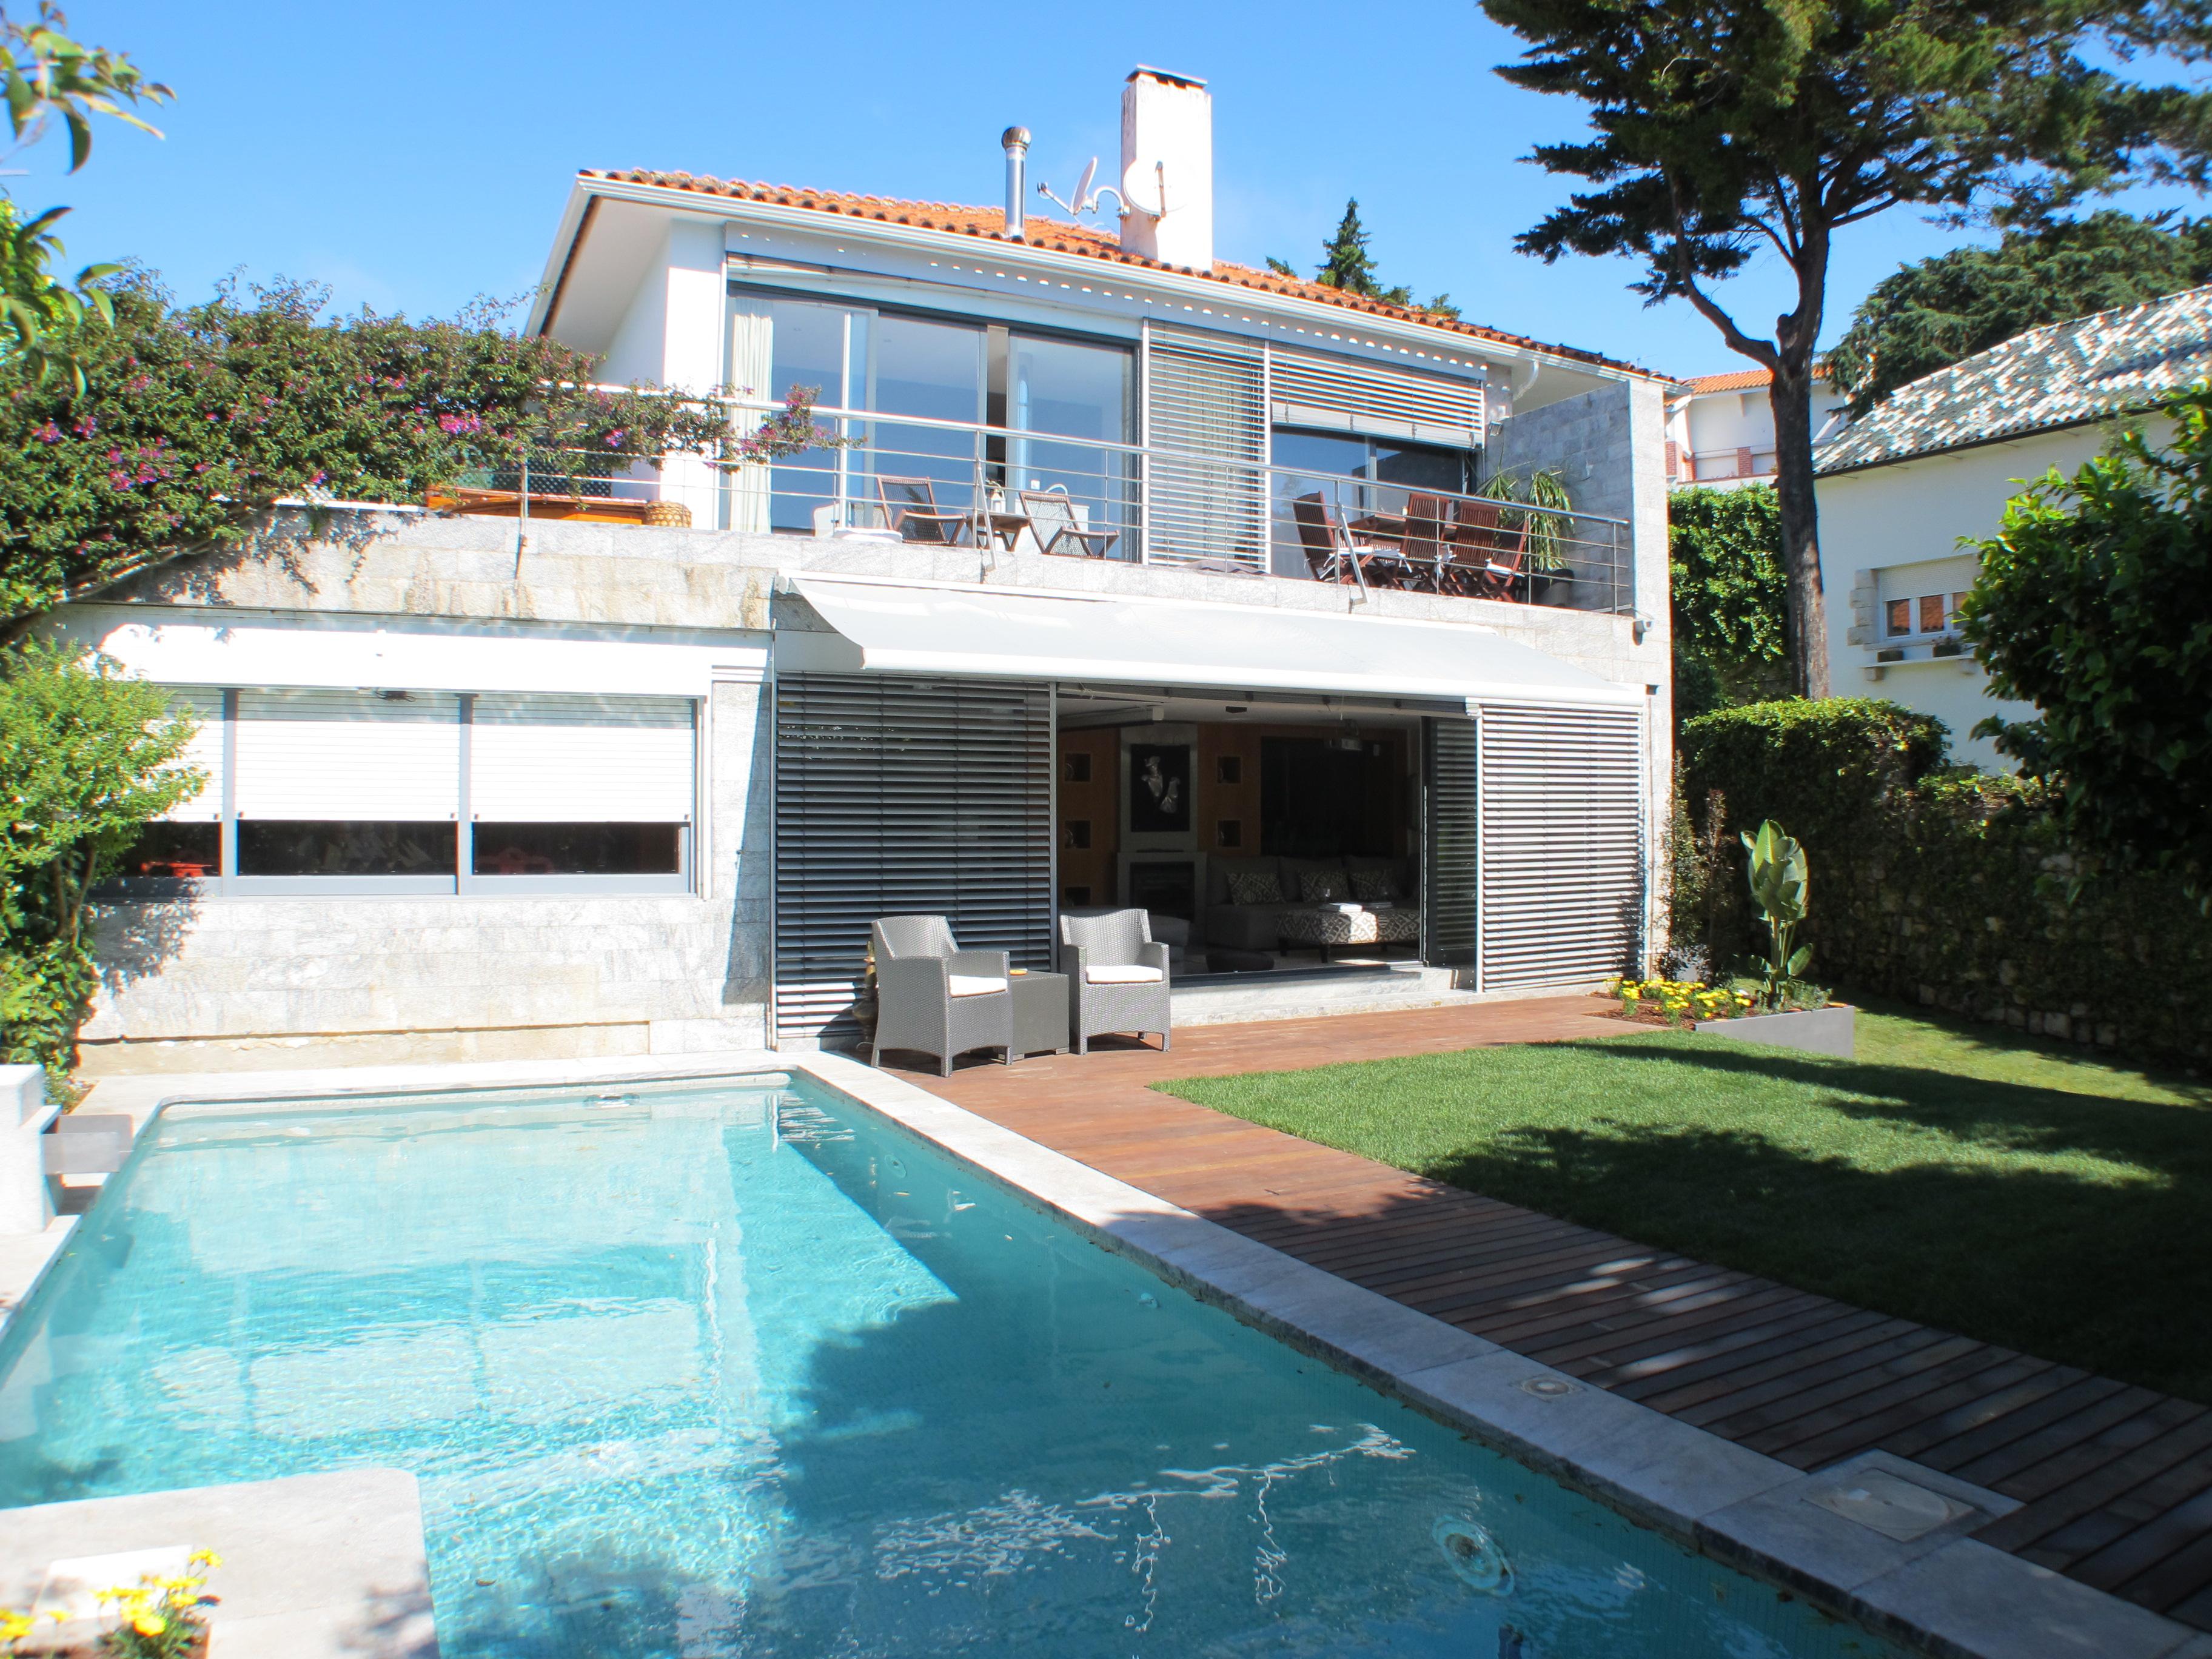 Estoril Atlantic Villas – Luxury villa with private pool in the centre of Estoril